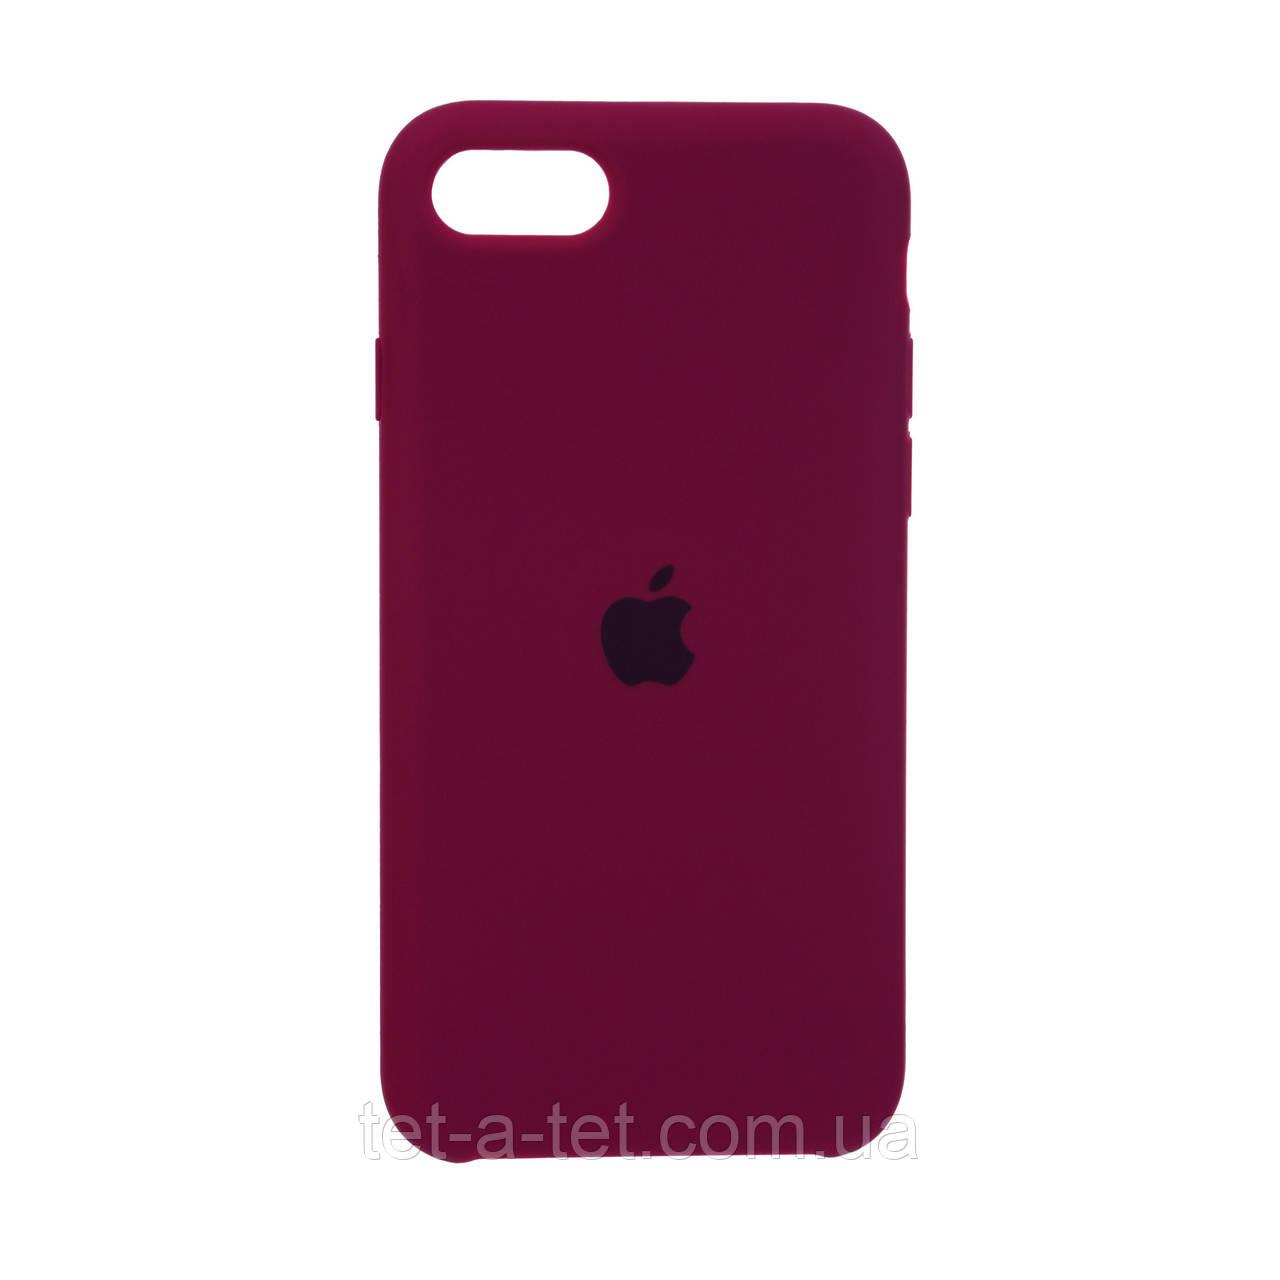 Чехол Silicone Case Original for Apple iPhone 7/8/SE 2020 (HC) - Marsala